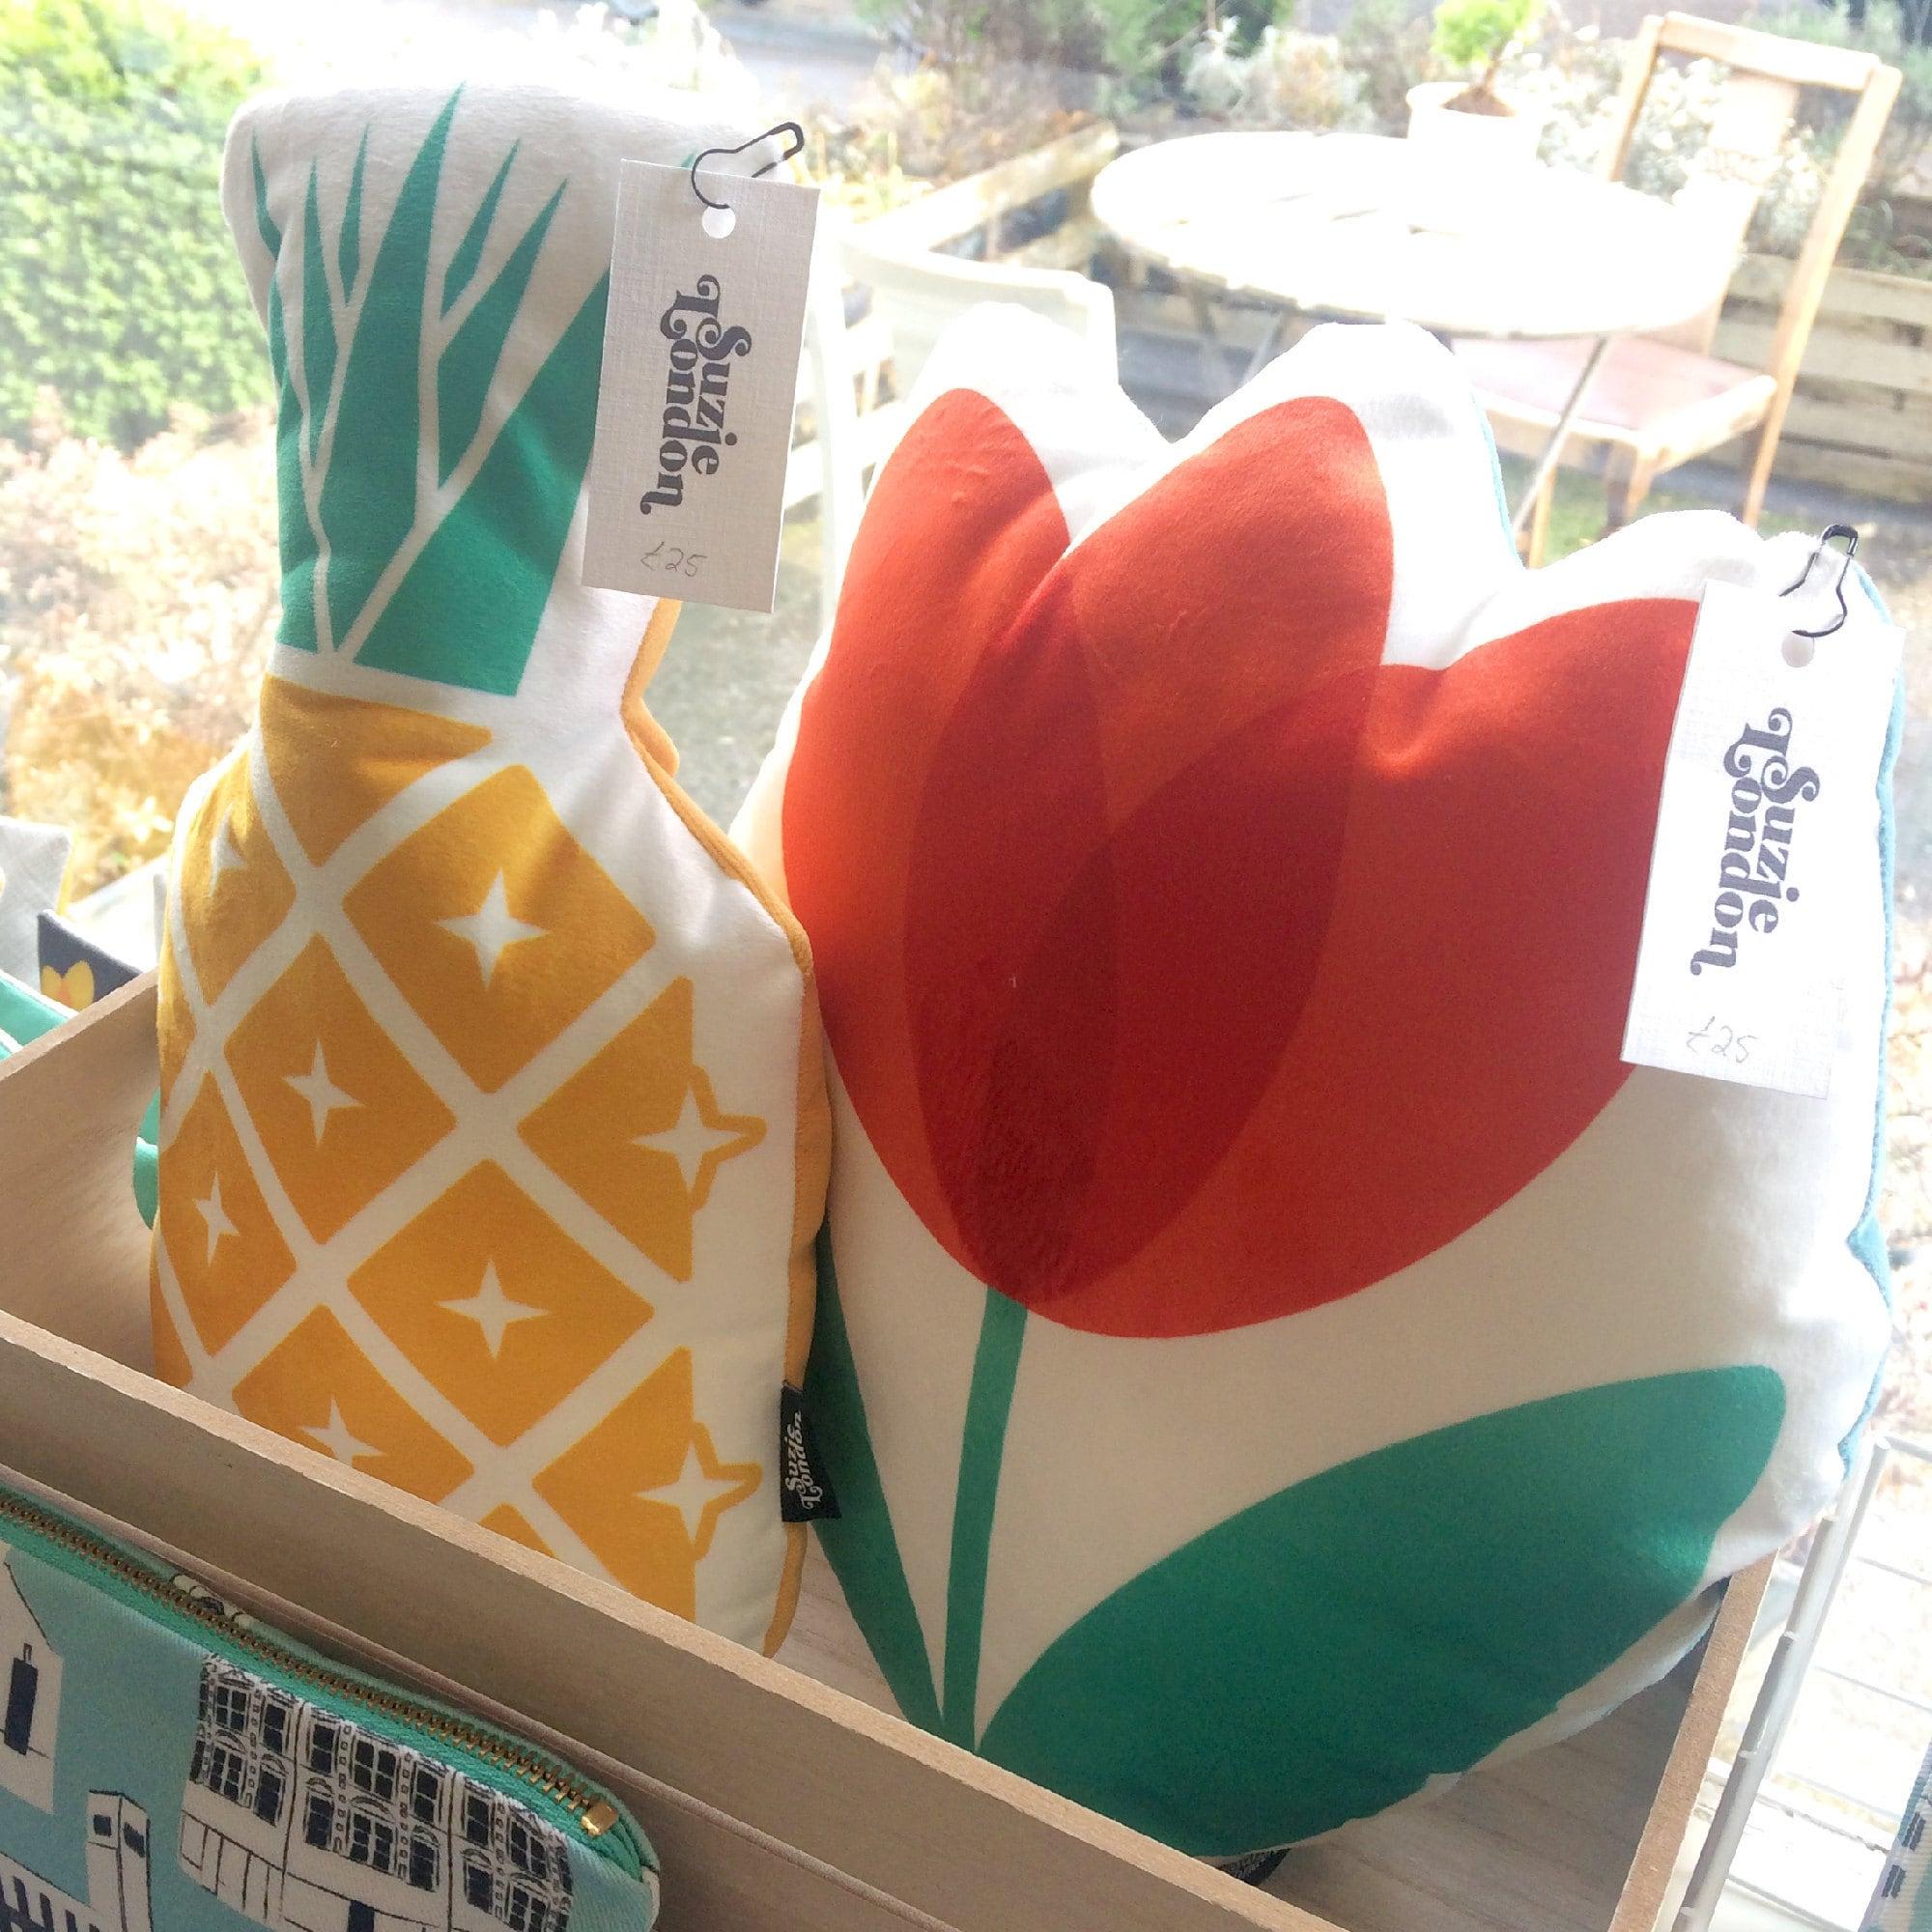 Suzie London Pineapple and Red Tulip velvet cushions